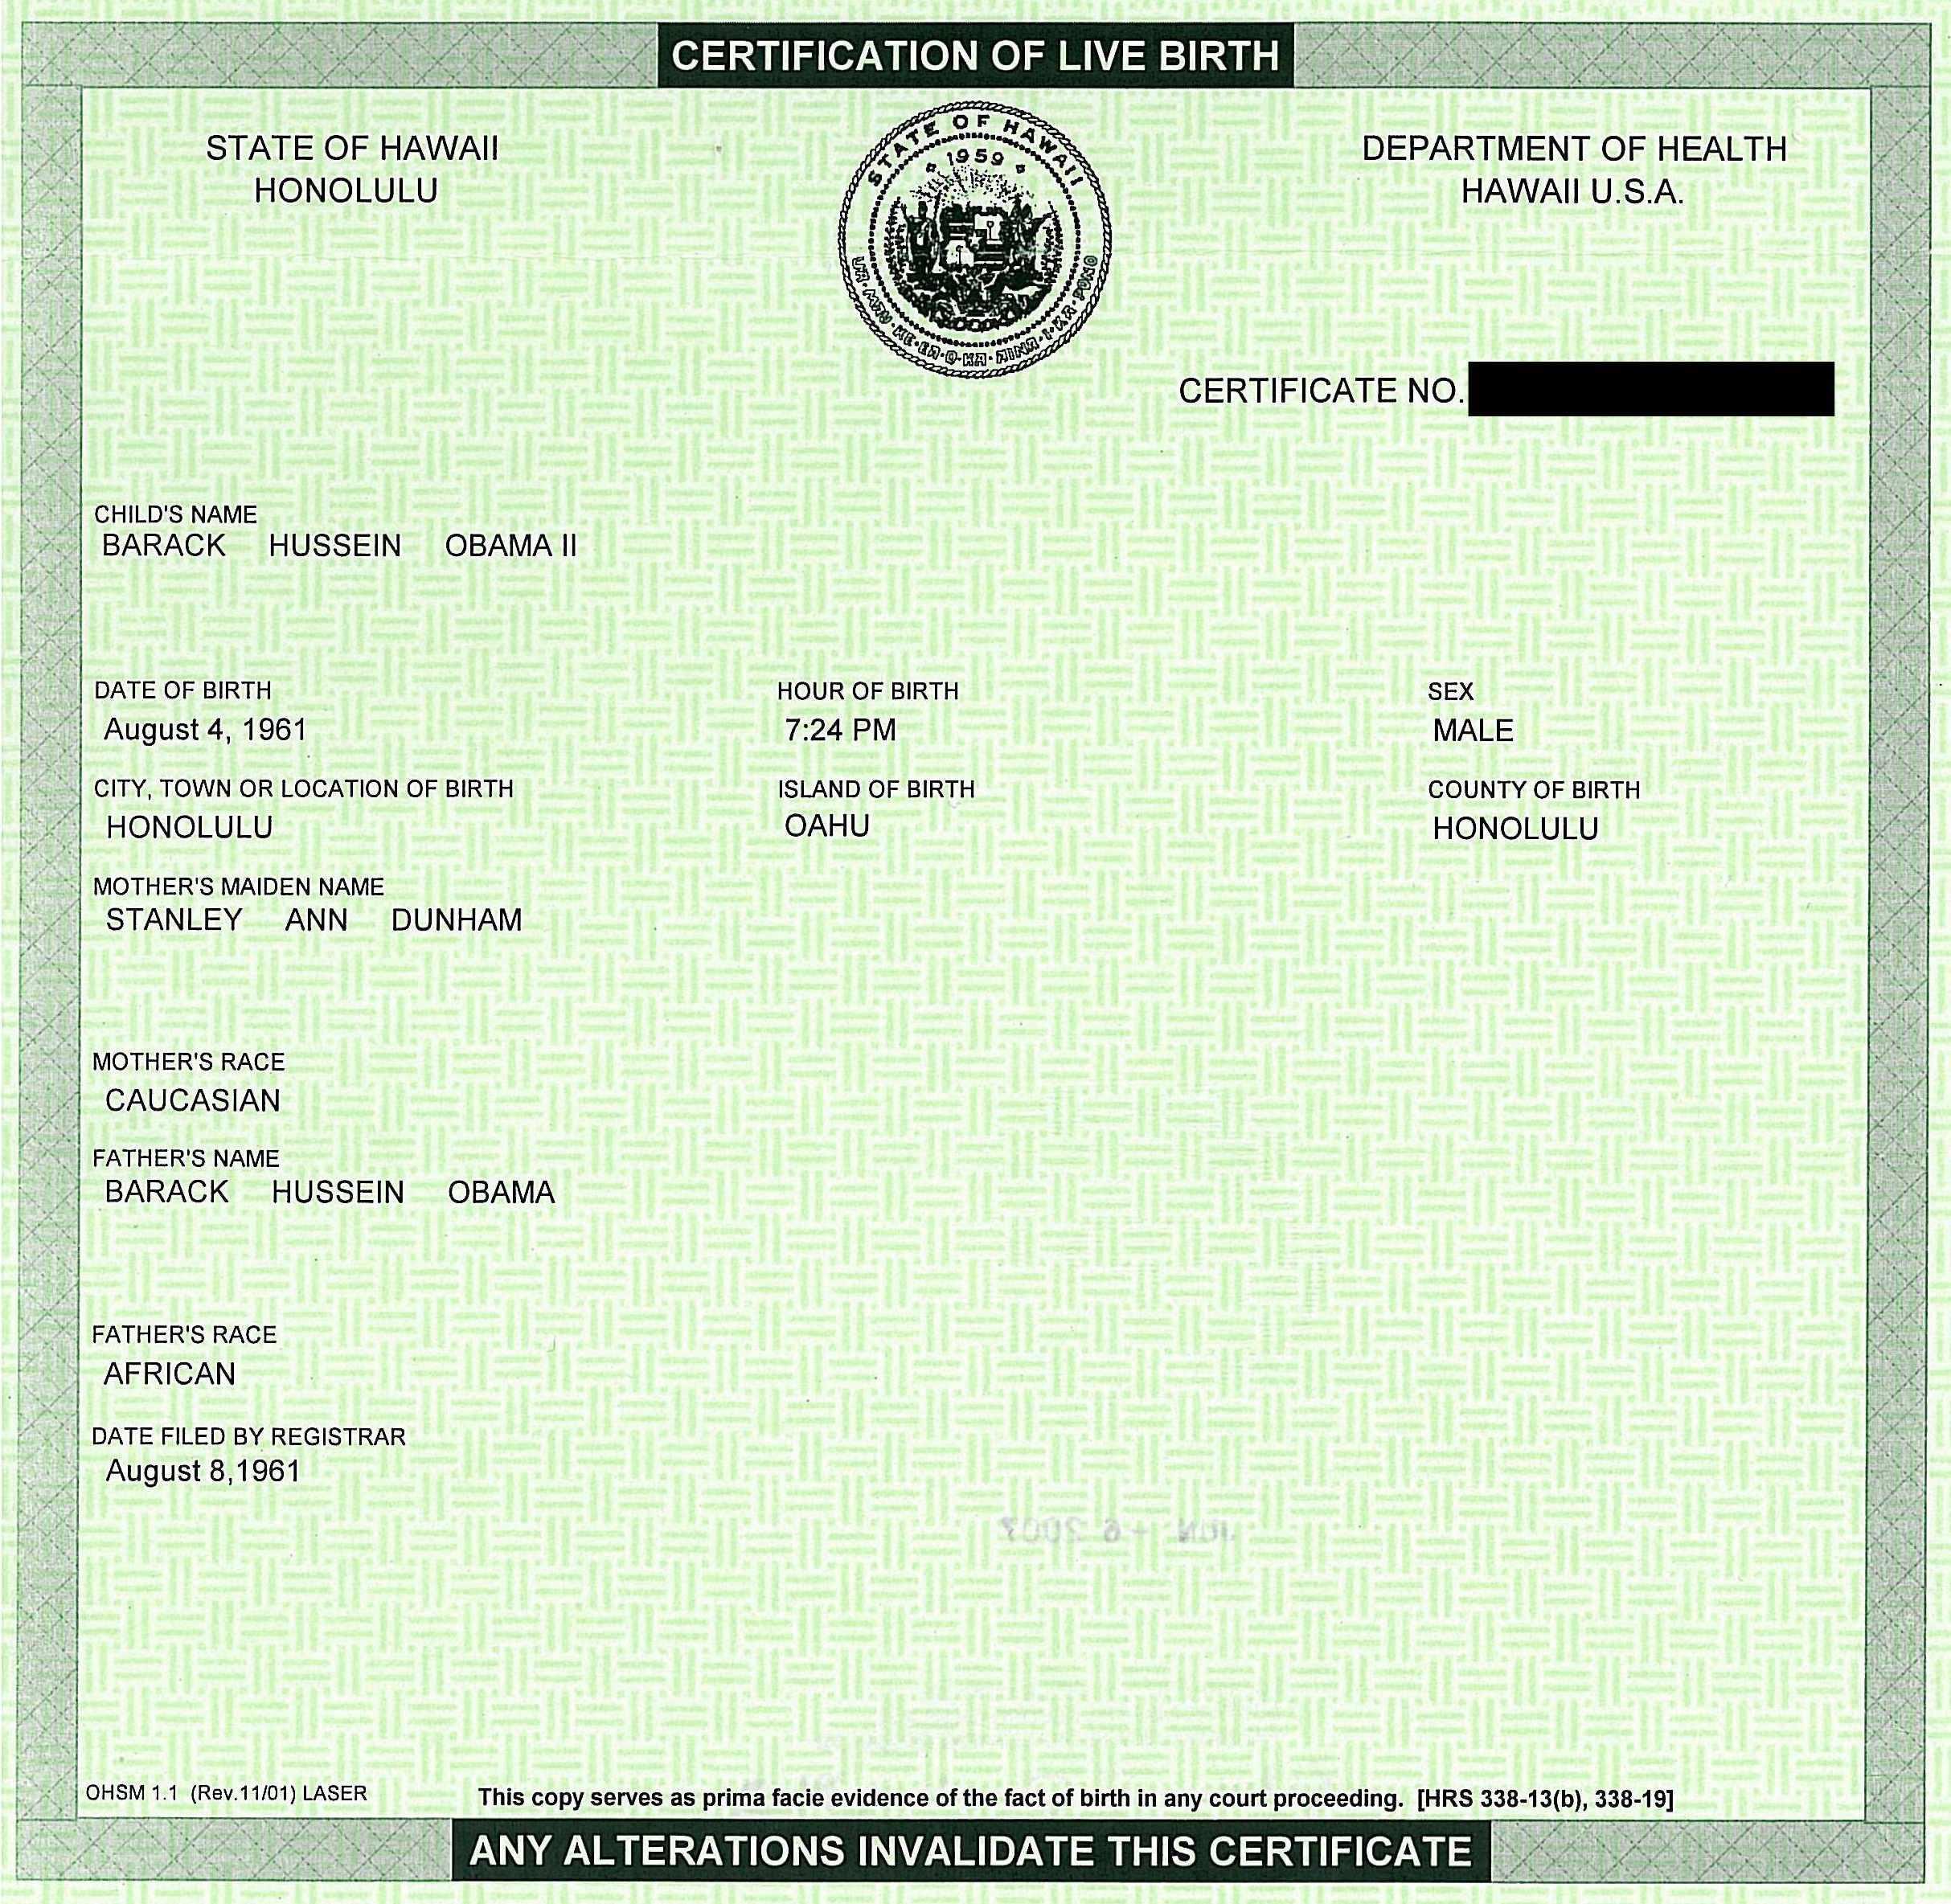 birth certificate template word – Birth Certificate Template